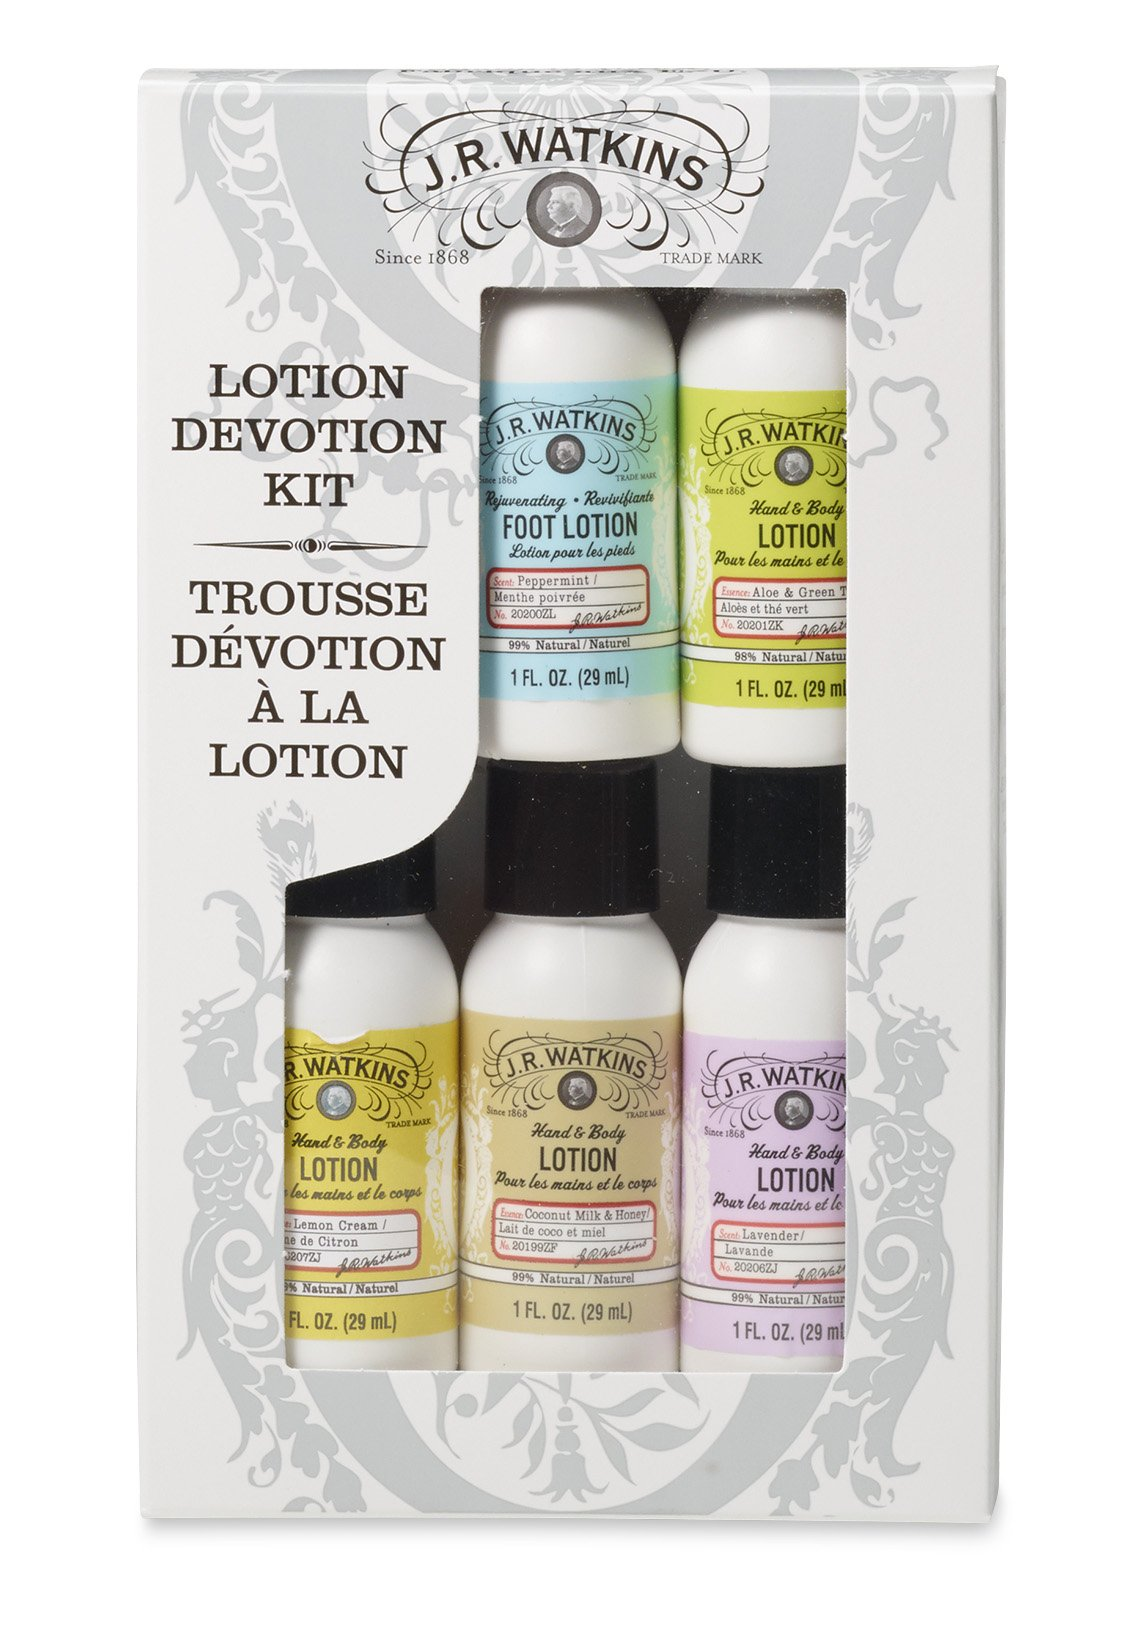 Pokupki customer account login/downloader - J R Watkins Skin Care Gift Set Lotion Devotion Hand Body Lotion Foot